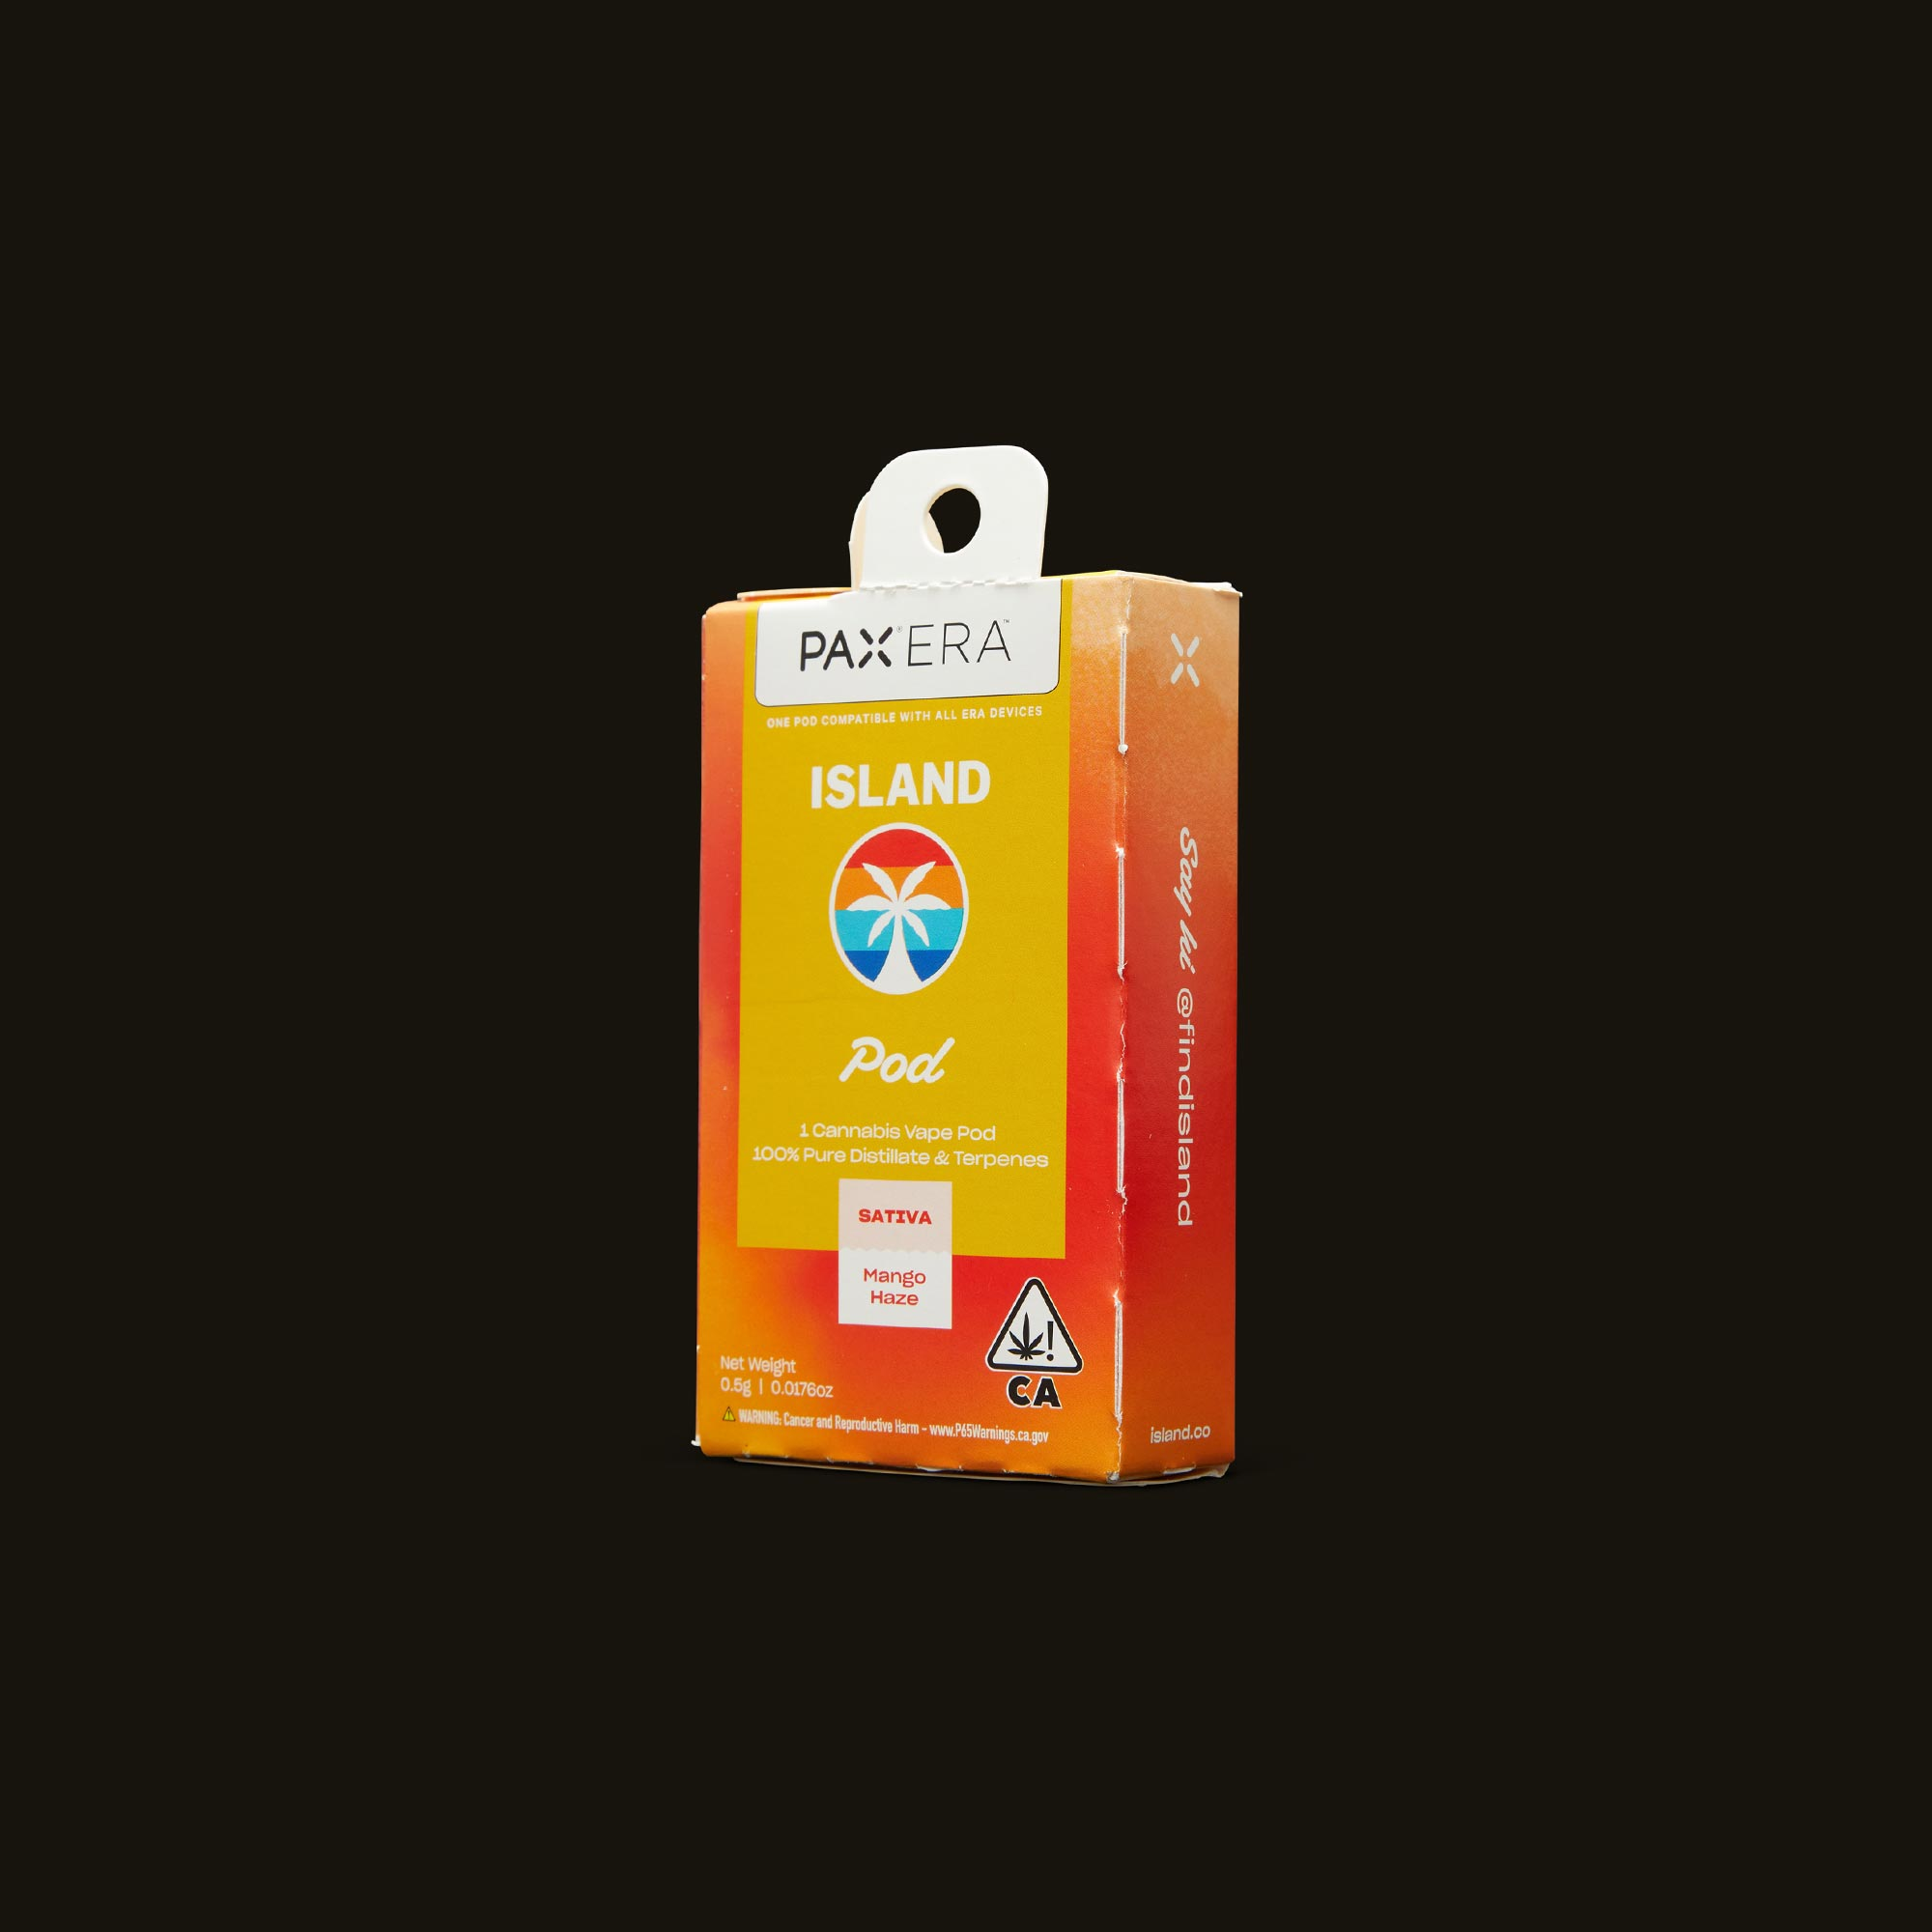 Island Mango Haze PAX Era Pod Side Packaging